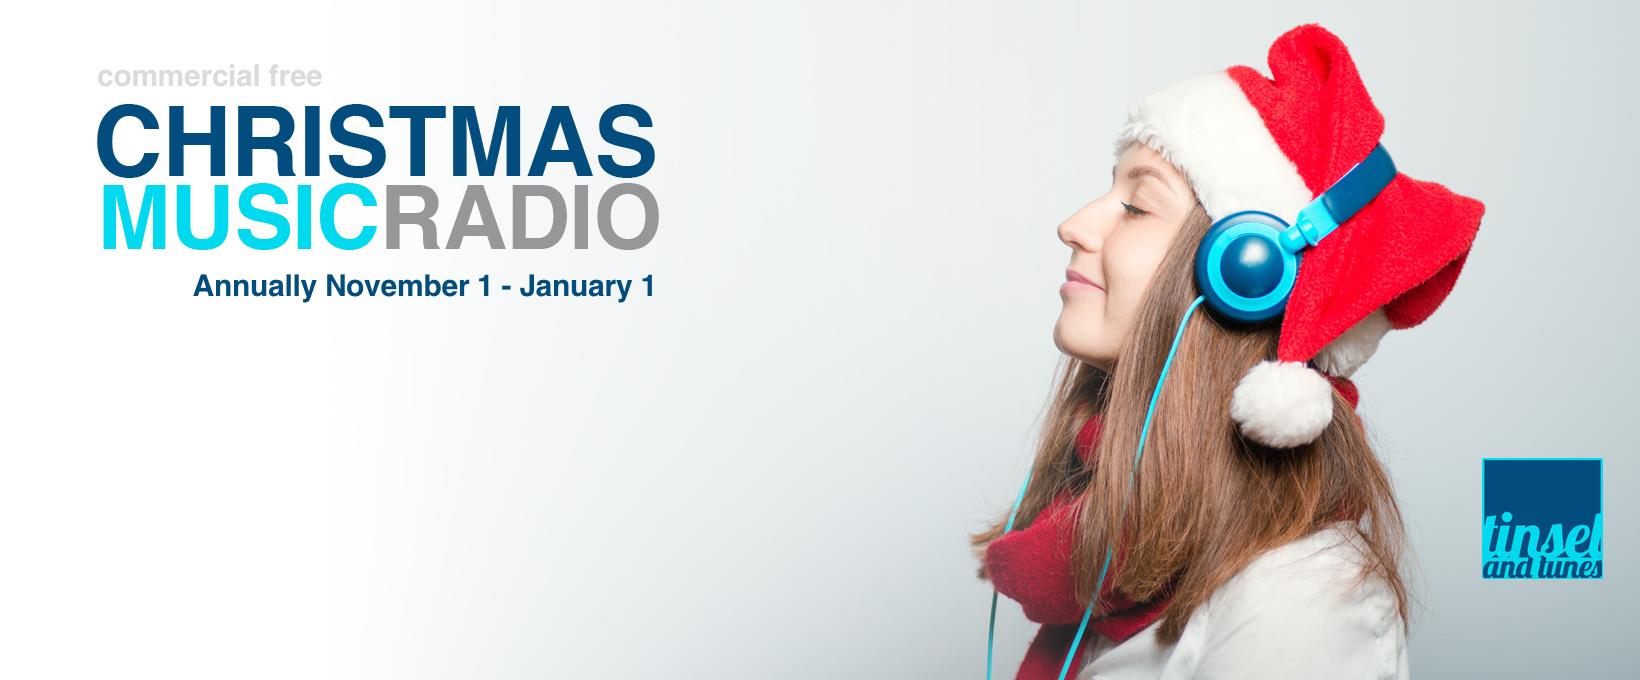 Tinsel & Tunes - Free Christmas Music 24/7